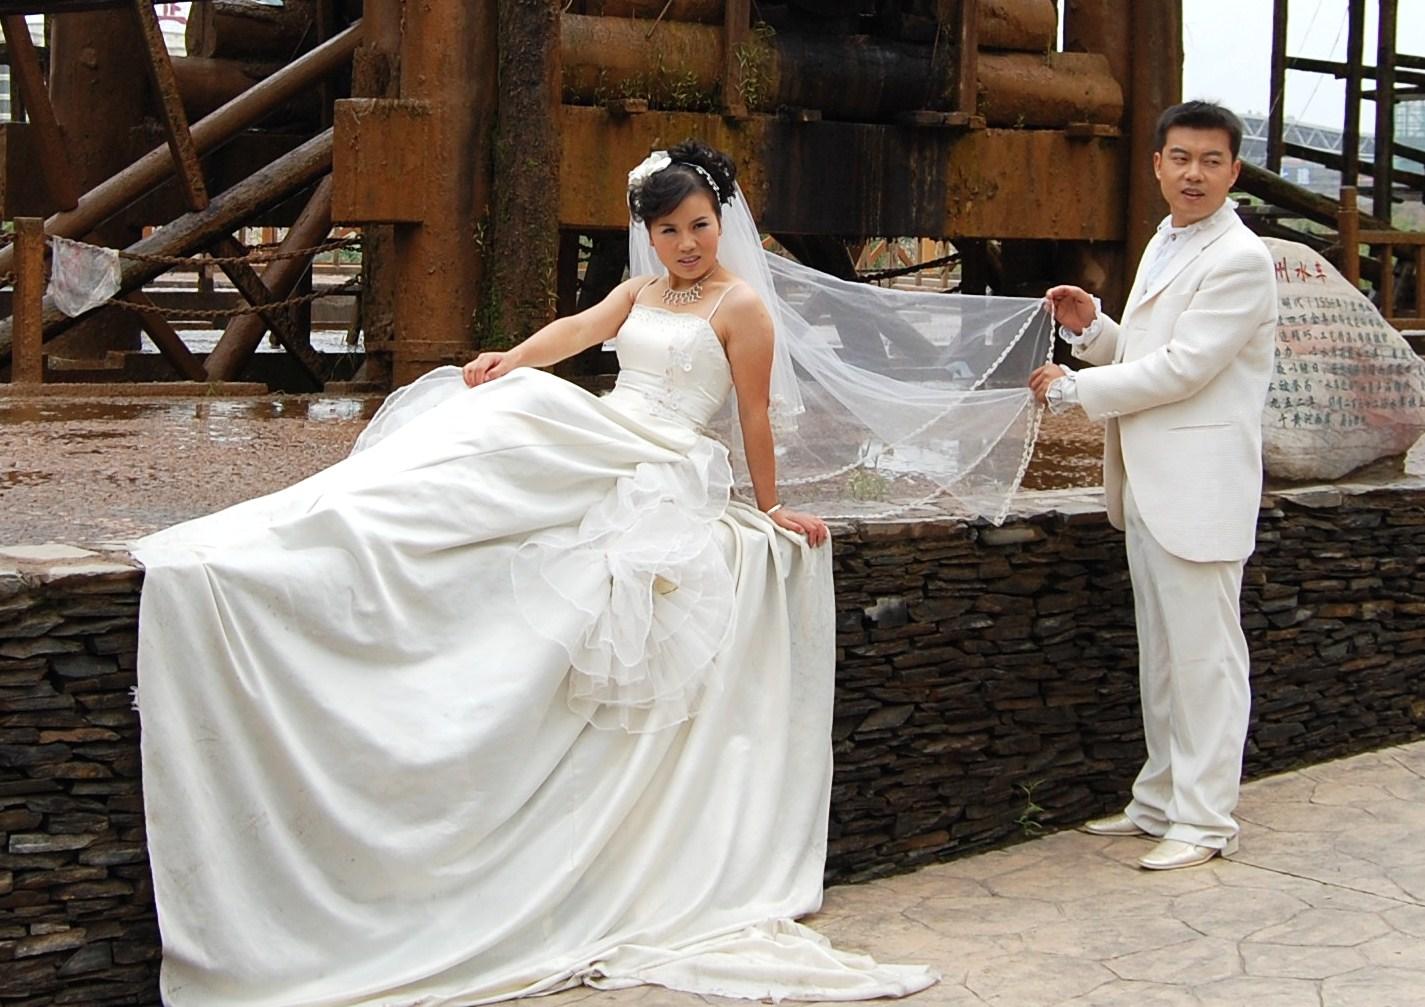 Are ryan guzman and briana evigan dating